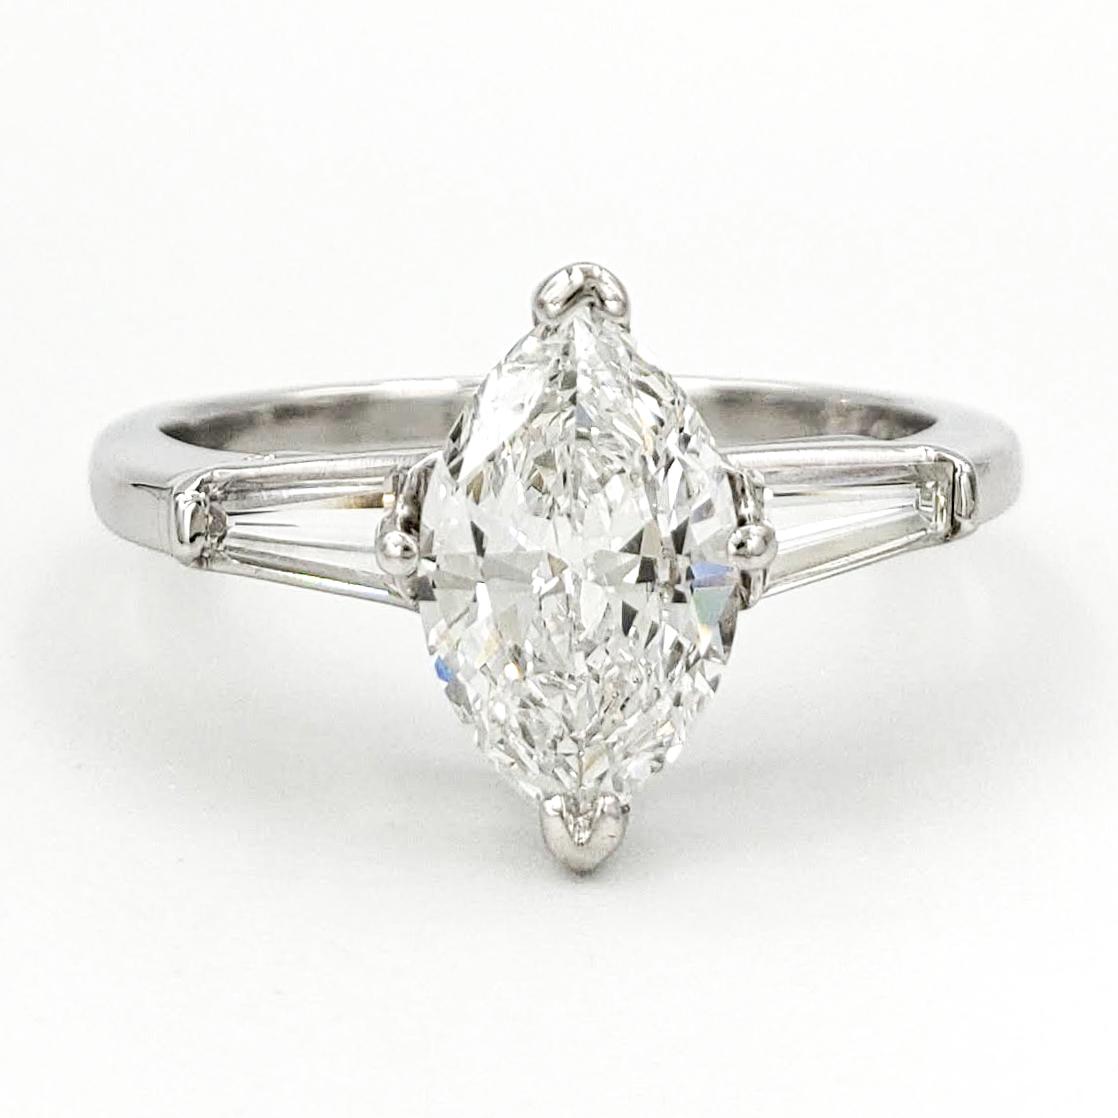 vintage-platinum-engagement-ring-with-0-93-carat-marquise-cut-diamond-egl-e-si1